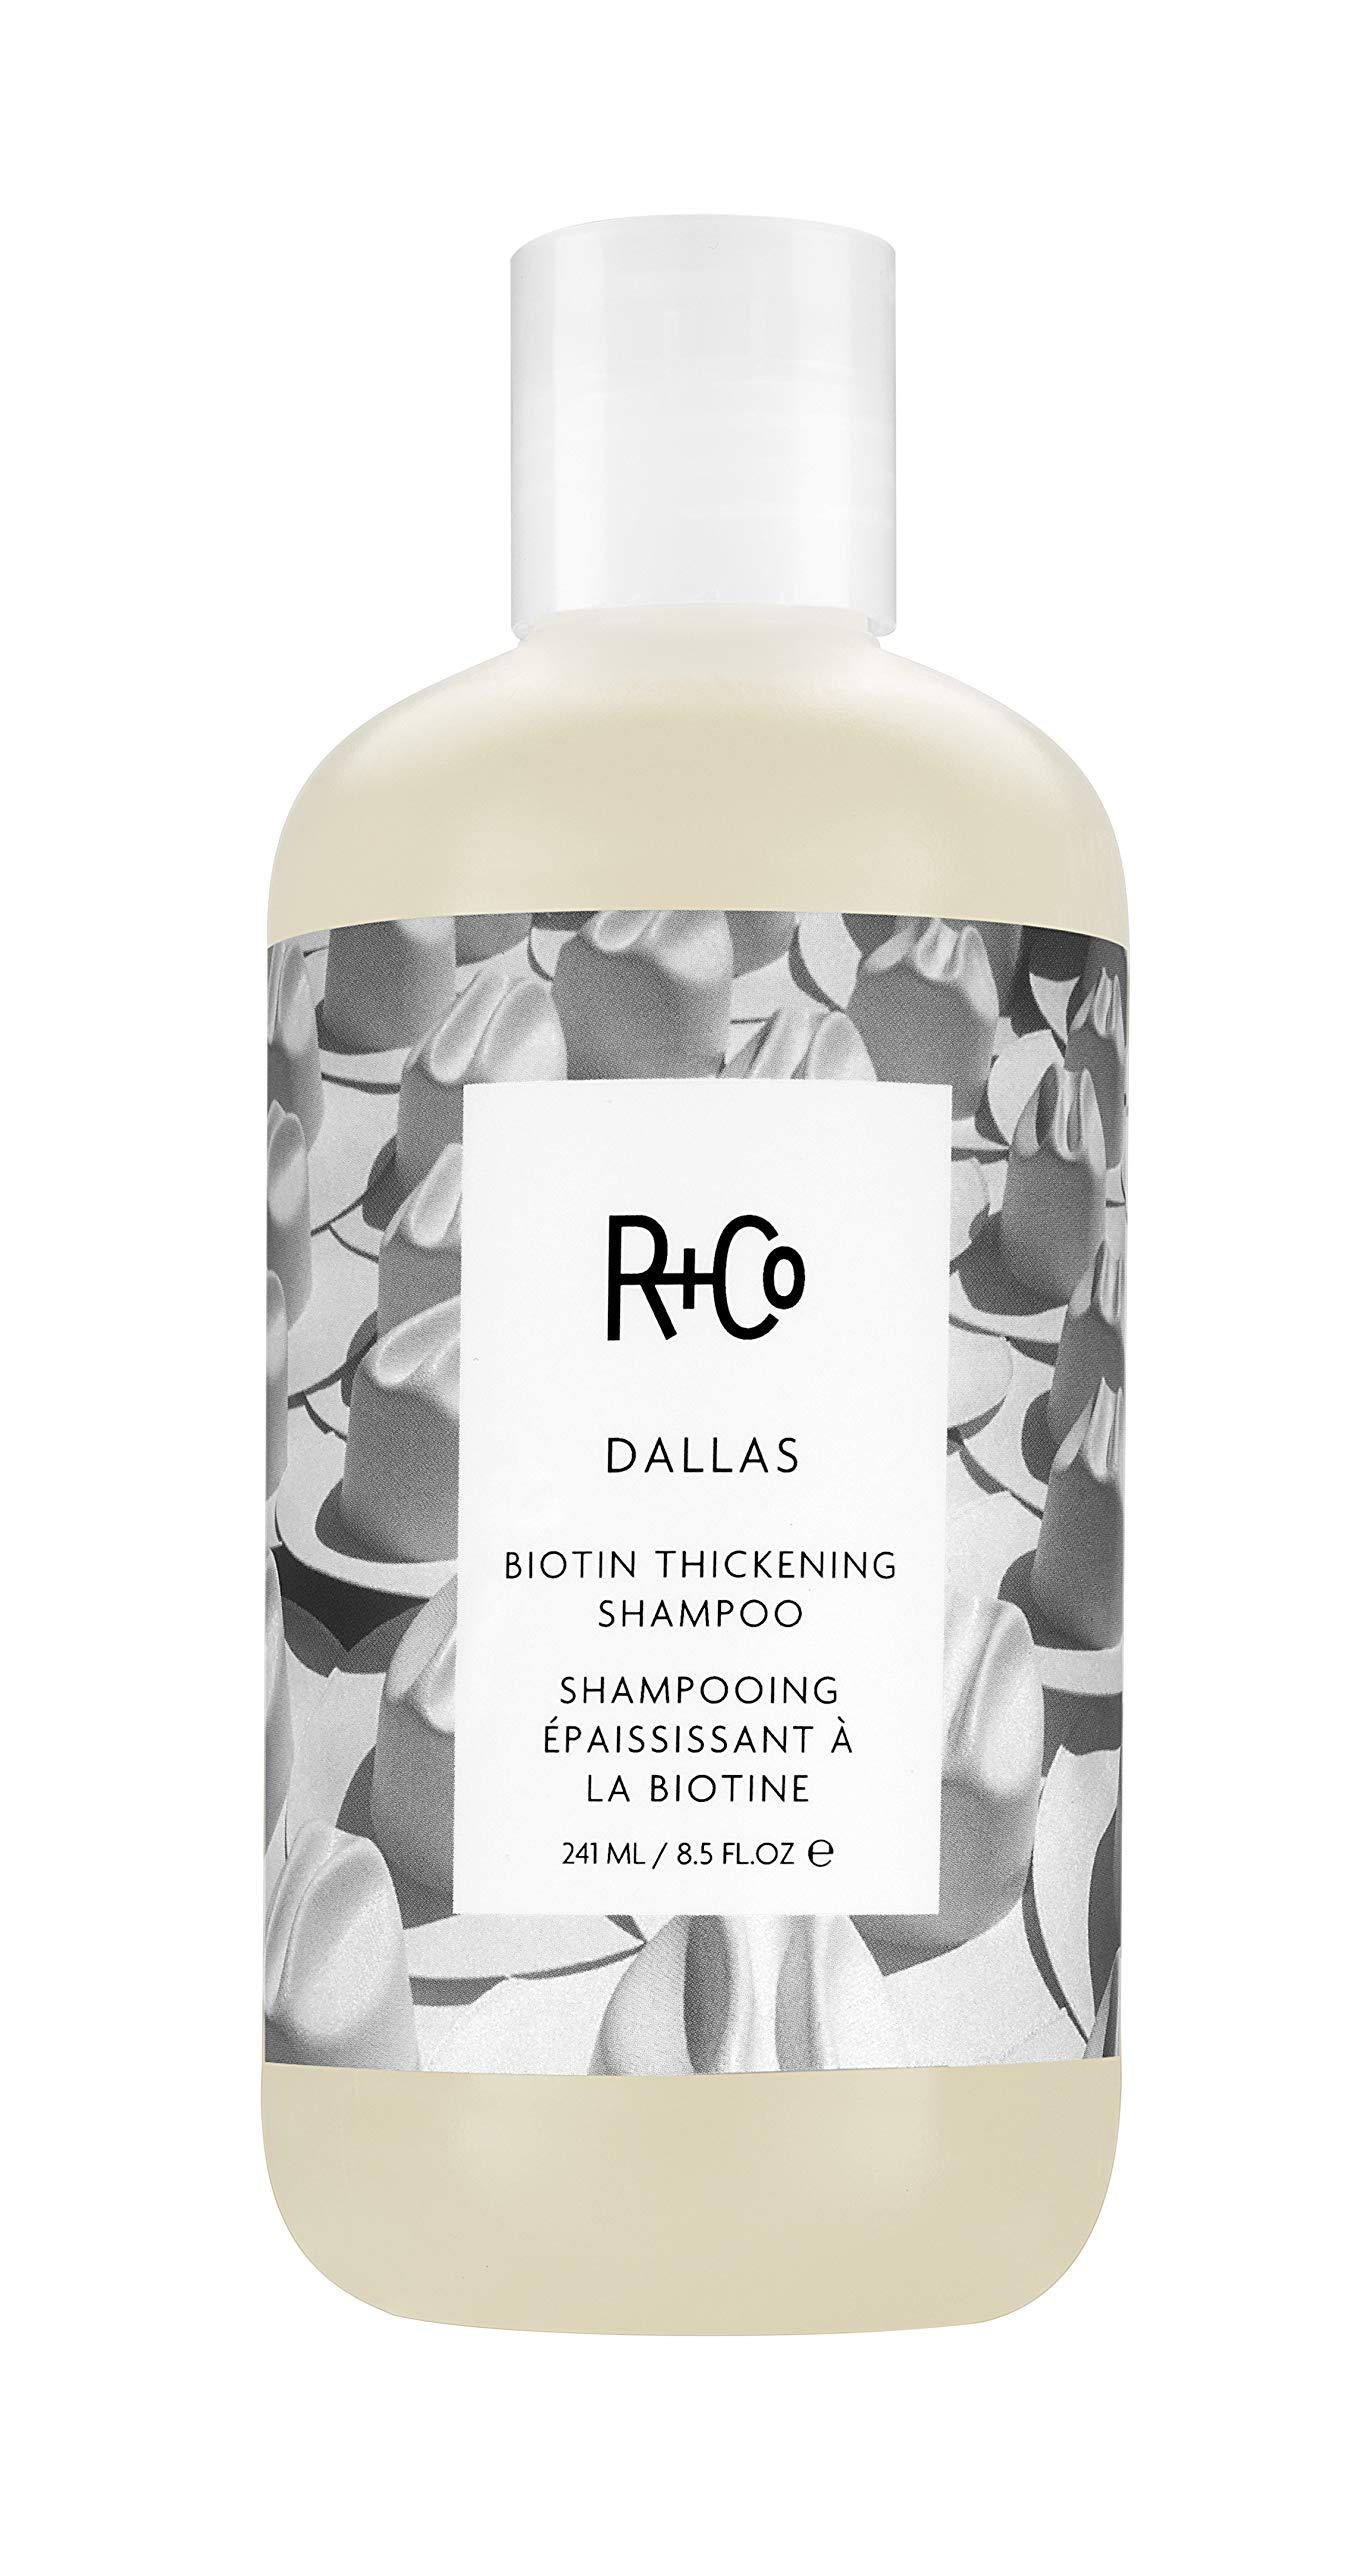 R+Co Dallas Biotin Thickening Shampoo by R+Co